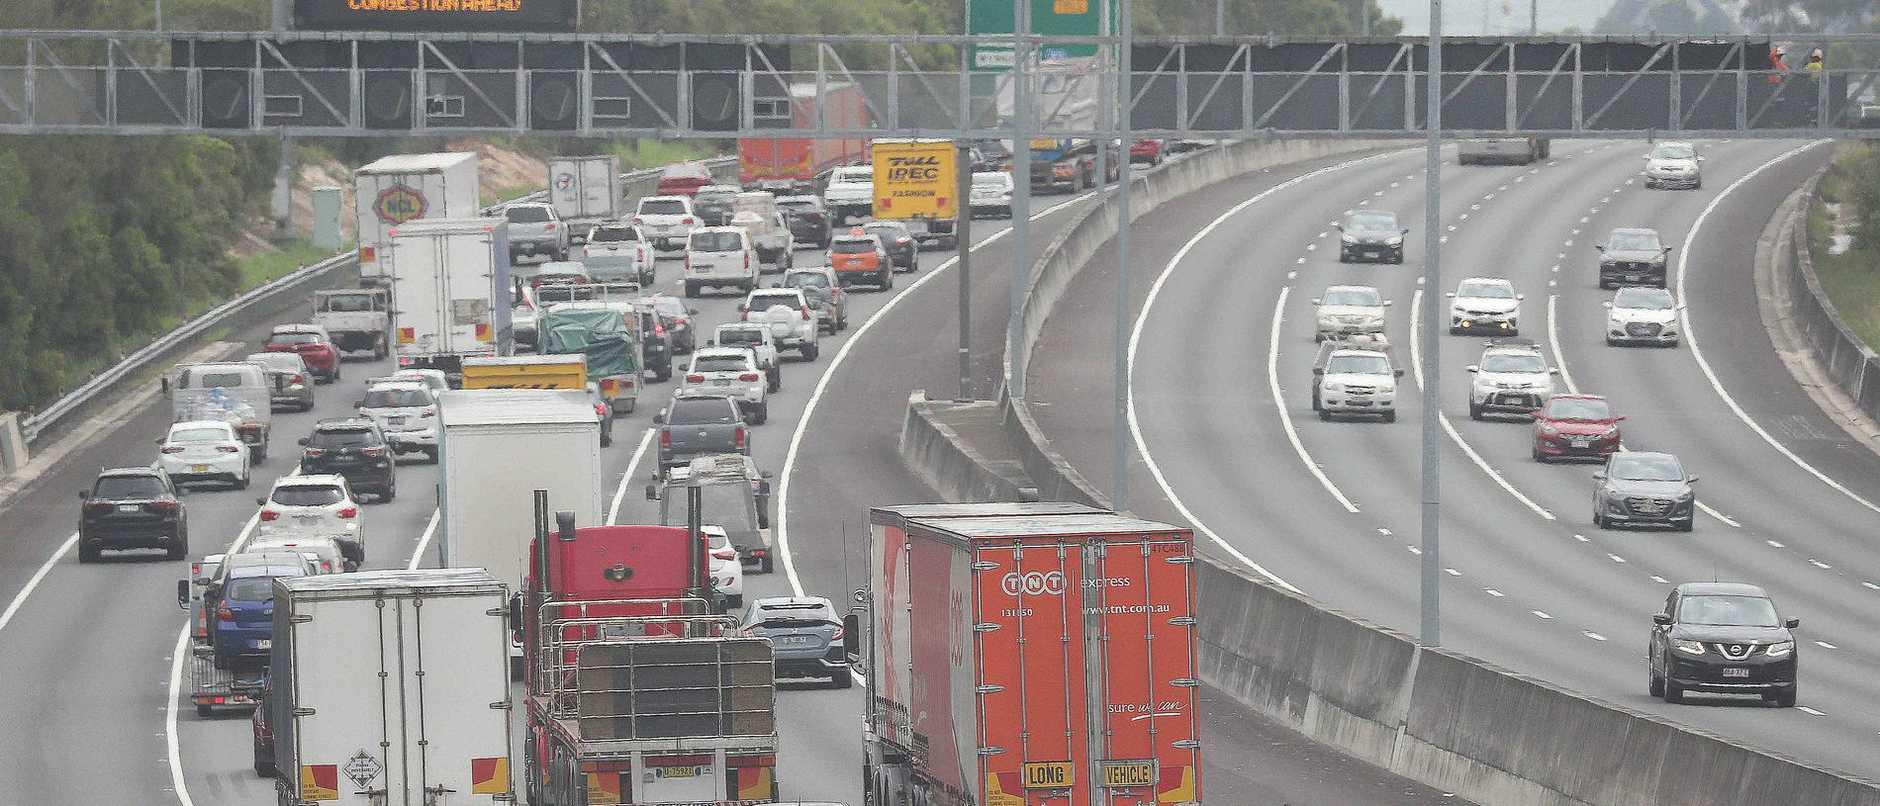 Queensland is set for a $415 million infrastructure spending splurge